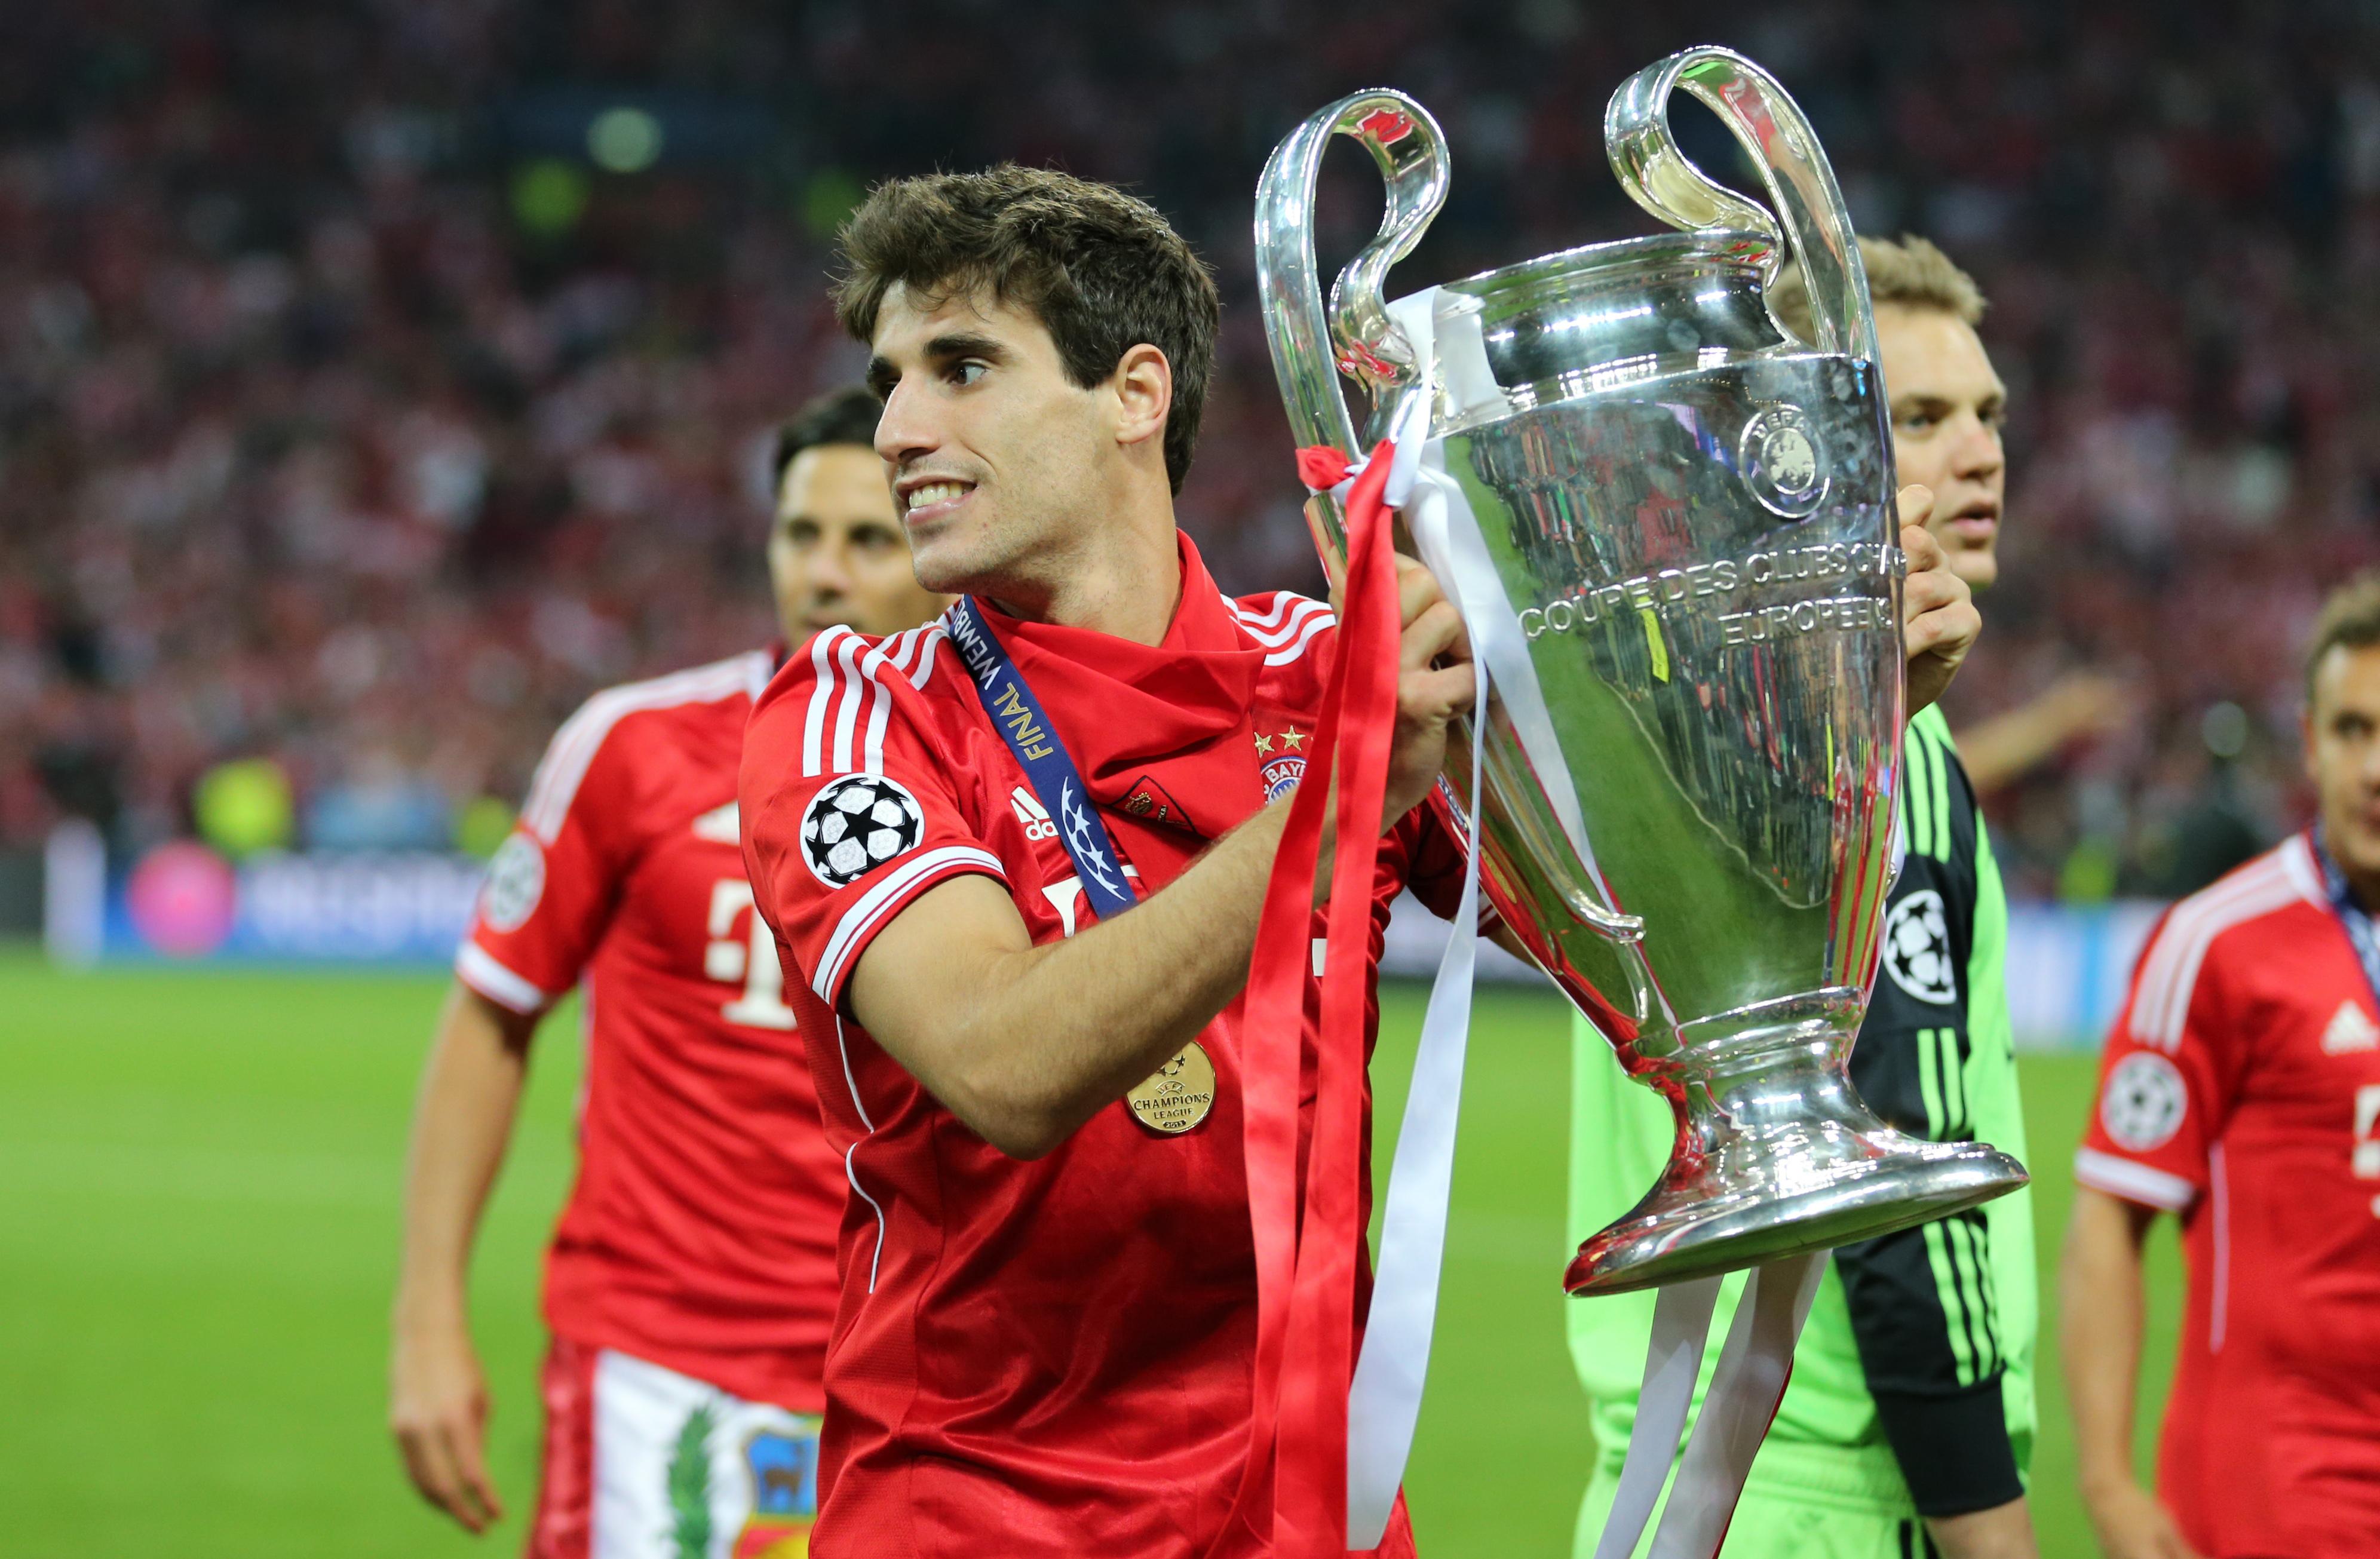 Soccer - UEFA Champions League Final 2013 - Borussia Dortmund vs. Bayern Munich